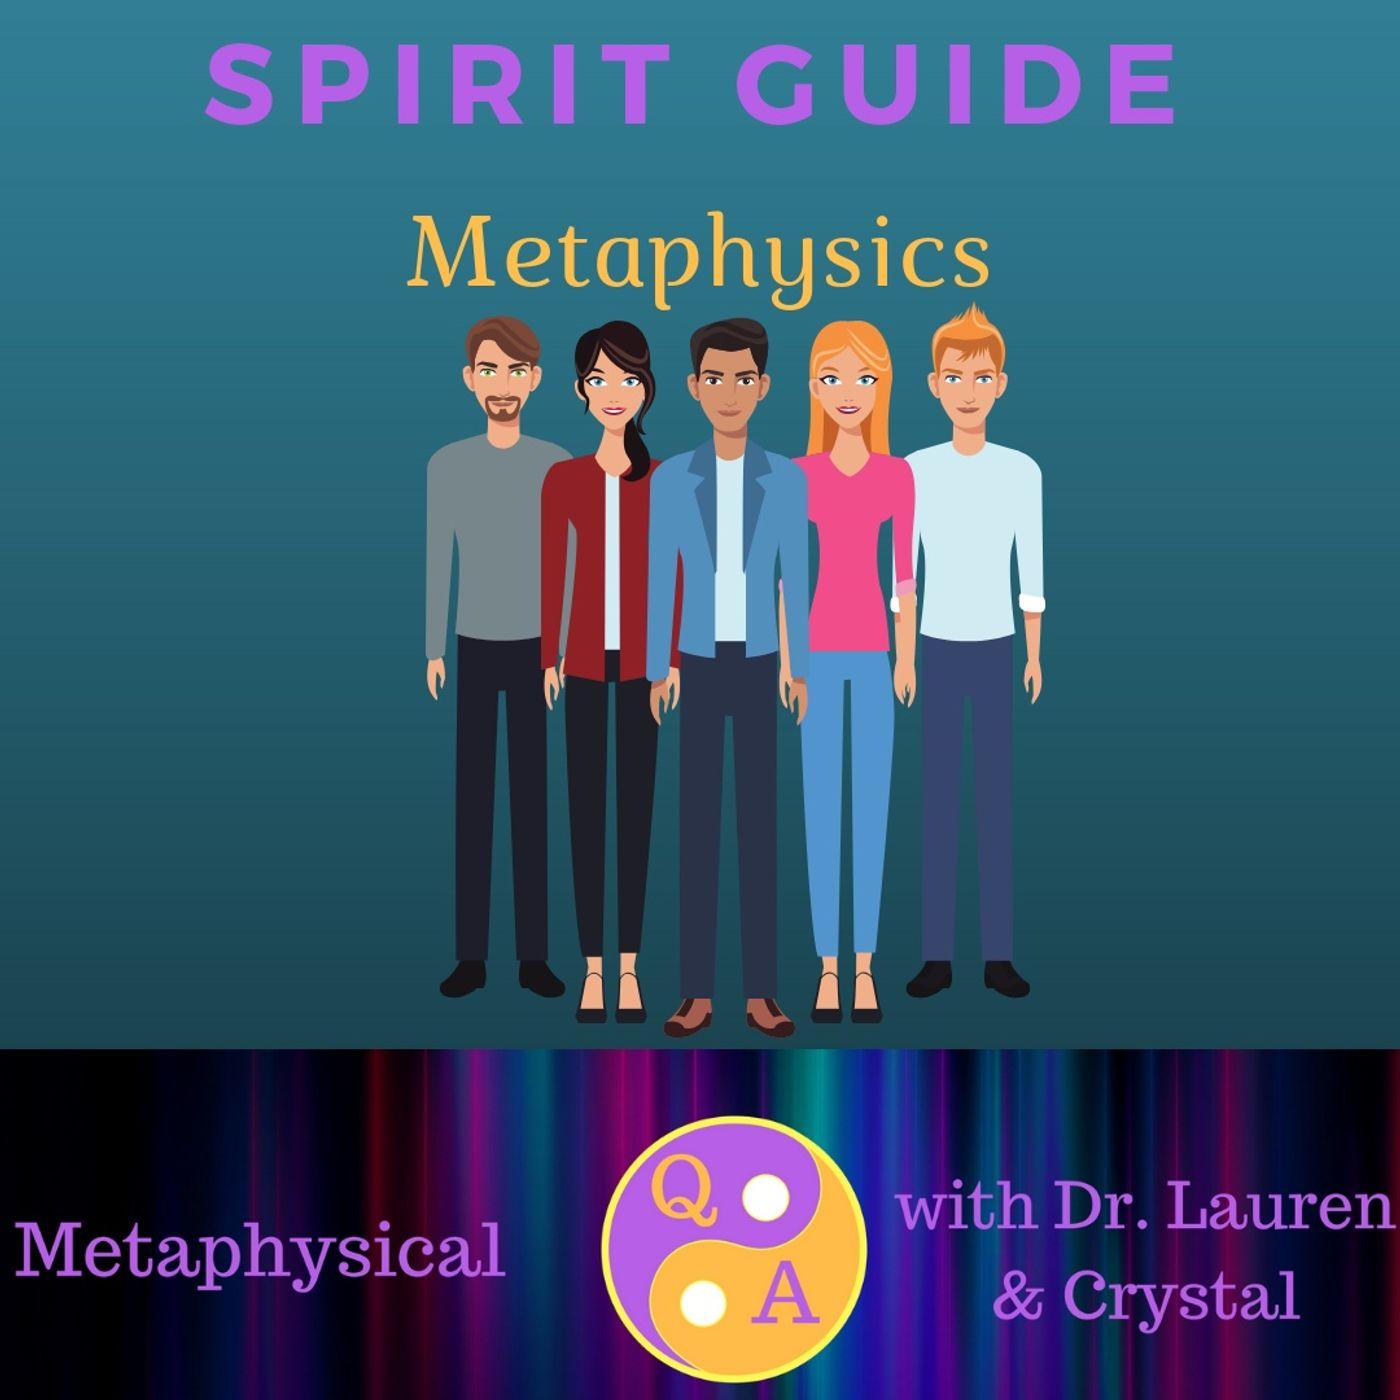 Spirit Guide Metaphysics